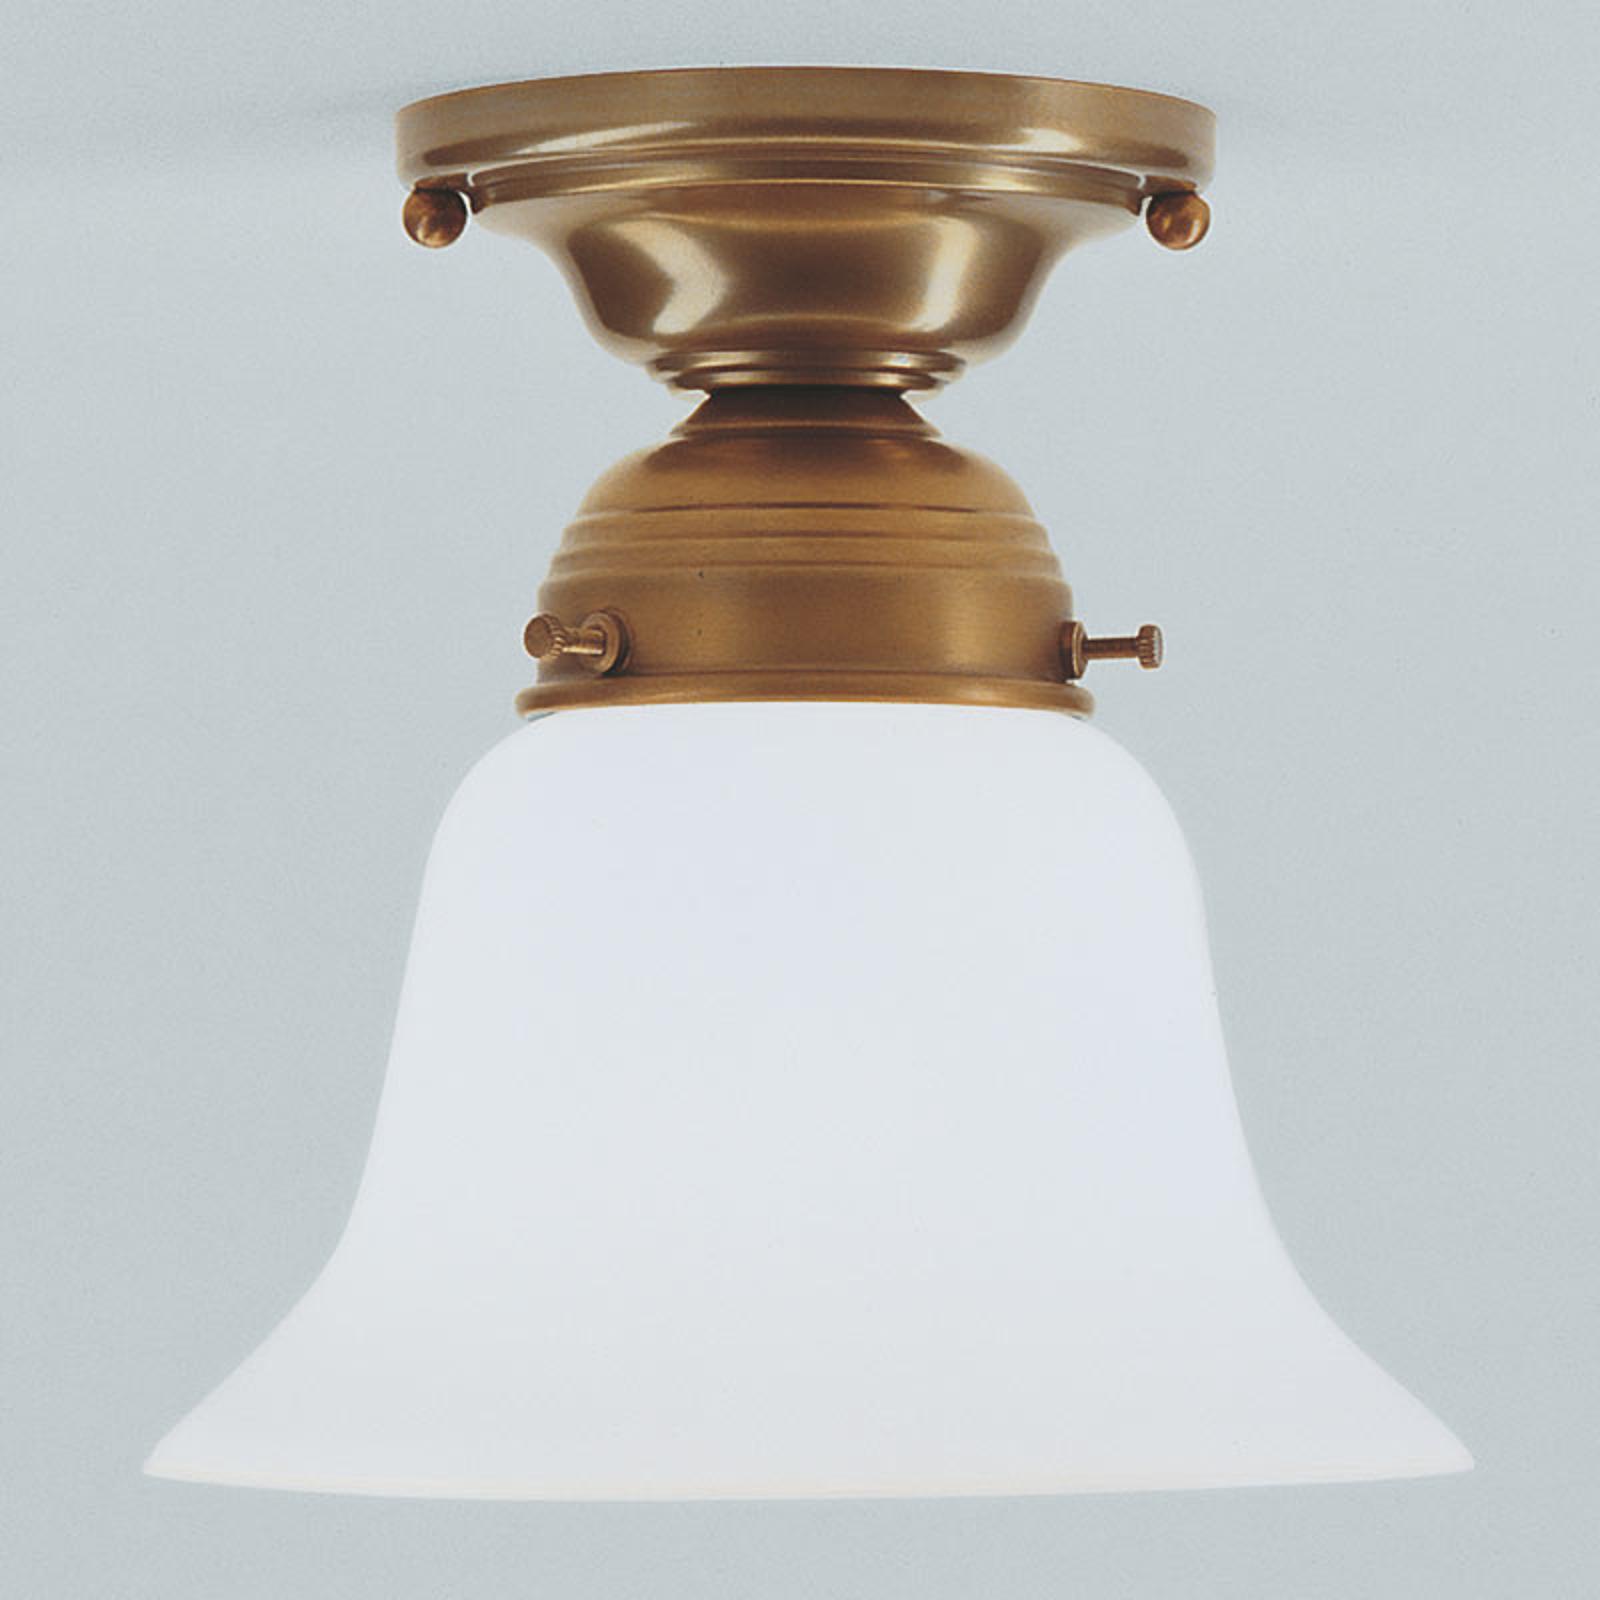 Messing plafondlamp Alena met glazen kap